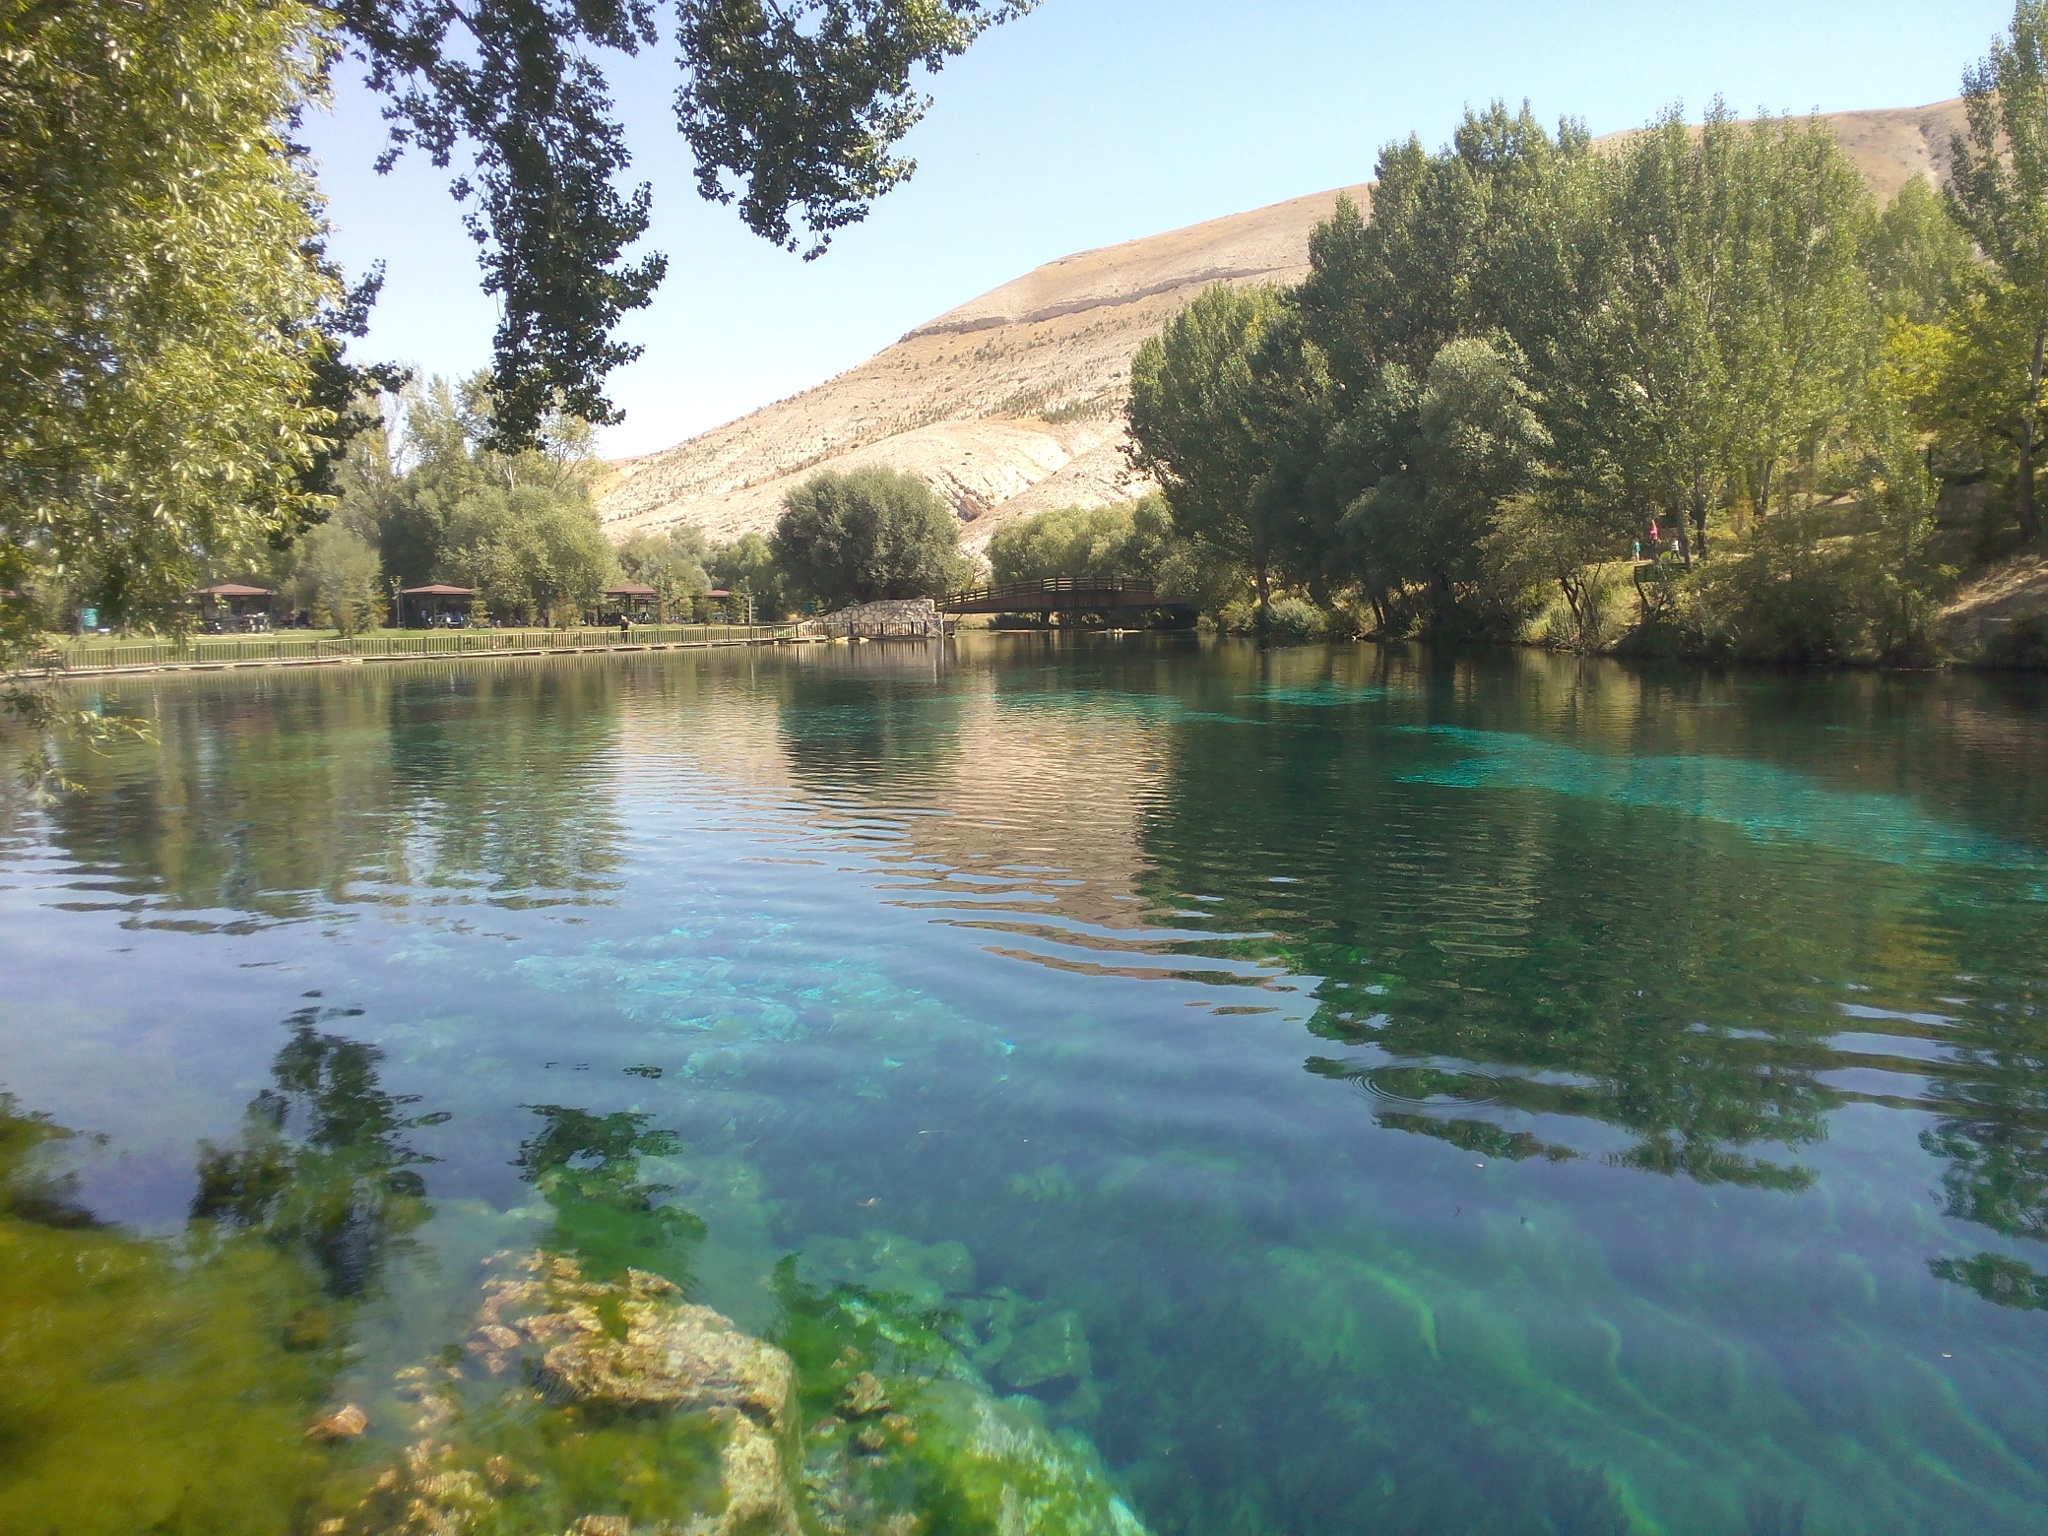 Gökpınar Gölü by Ali Nail T